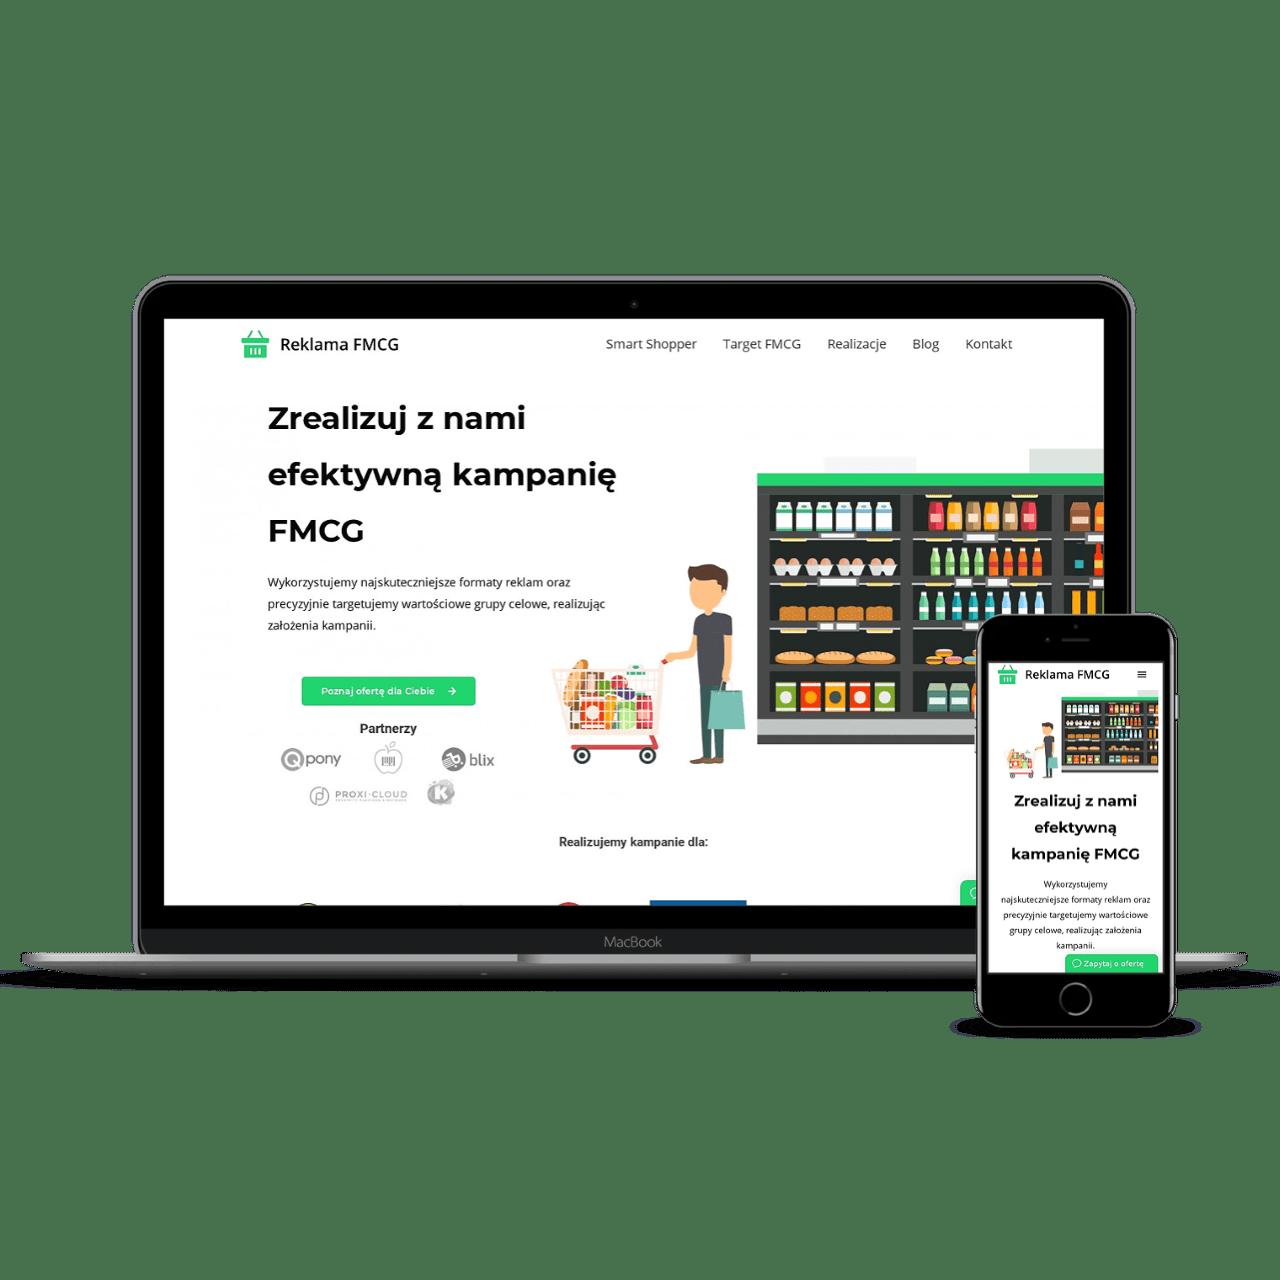 ReklamaFMCG website